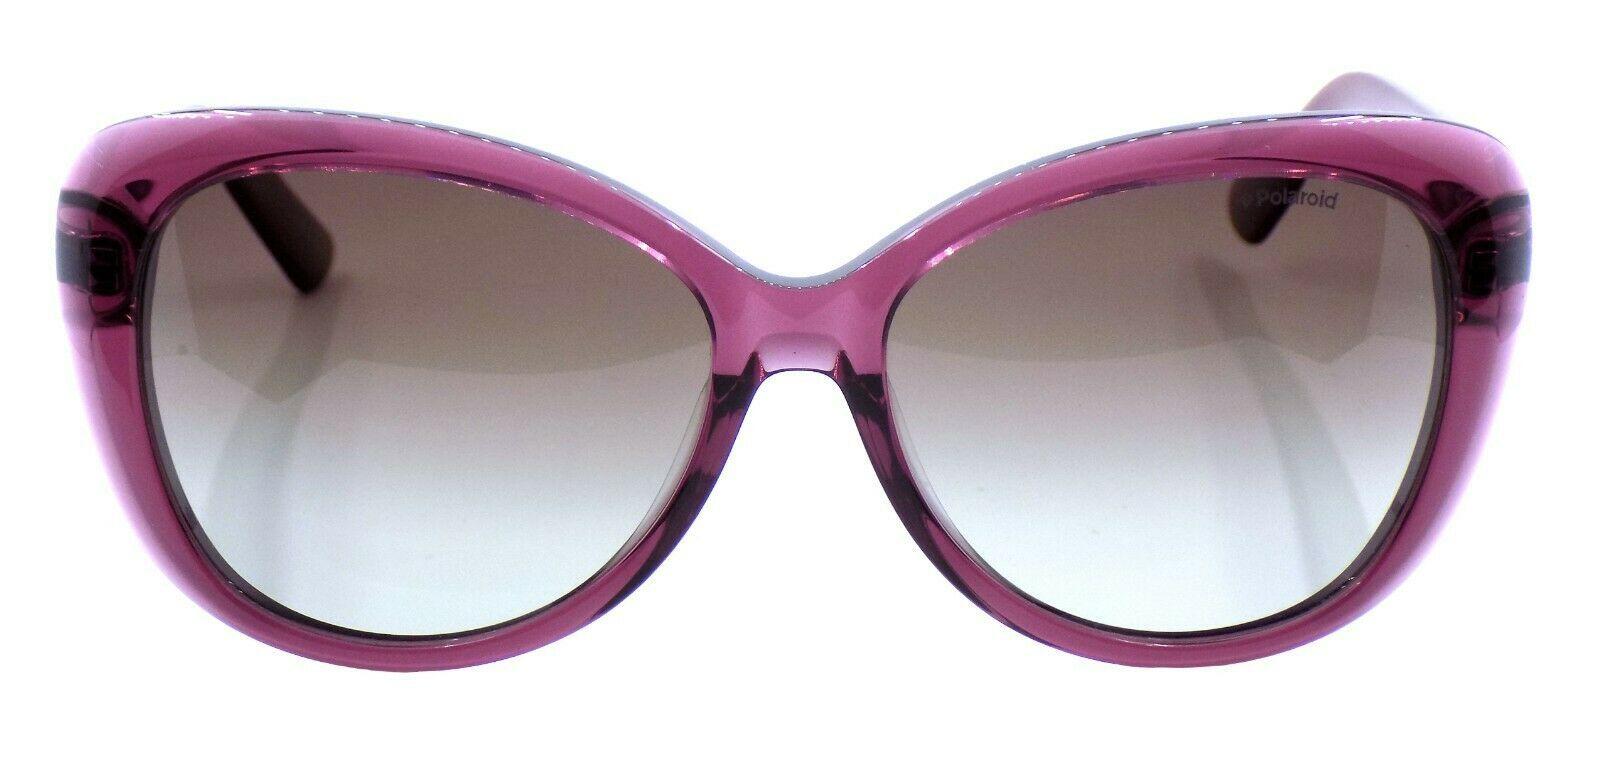 Polaroid PLD 4050/U/S LHFWJ Women's Sunglasses 58-16-140 Burgundy / Gray